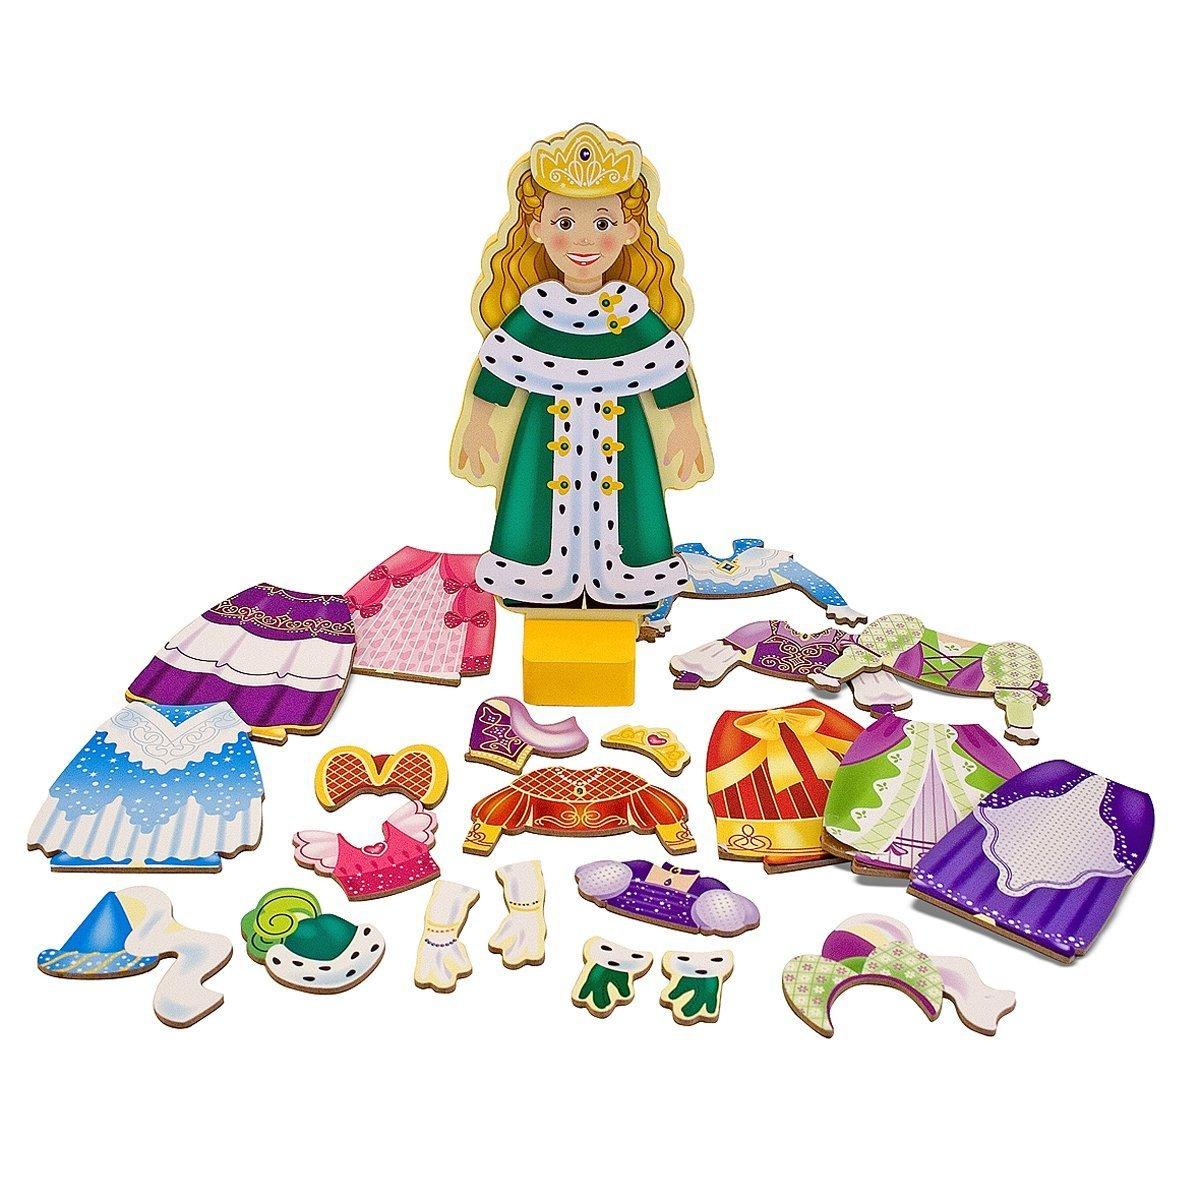 Melissa & Doug Princess Elise - Magnetic Dress Up Wooden Doll & Stand + FREE Scratch Art Mini-Pad Bundle [35538]